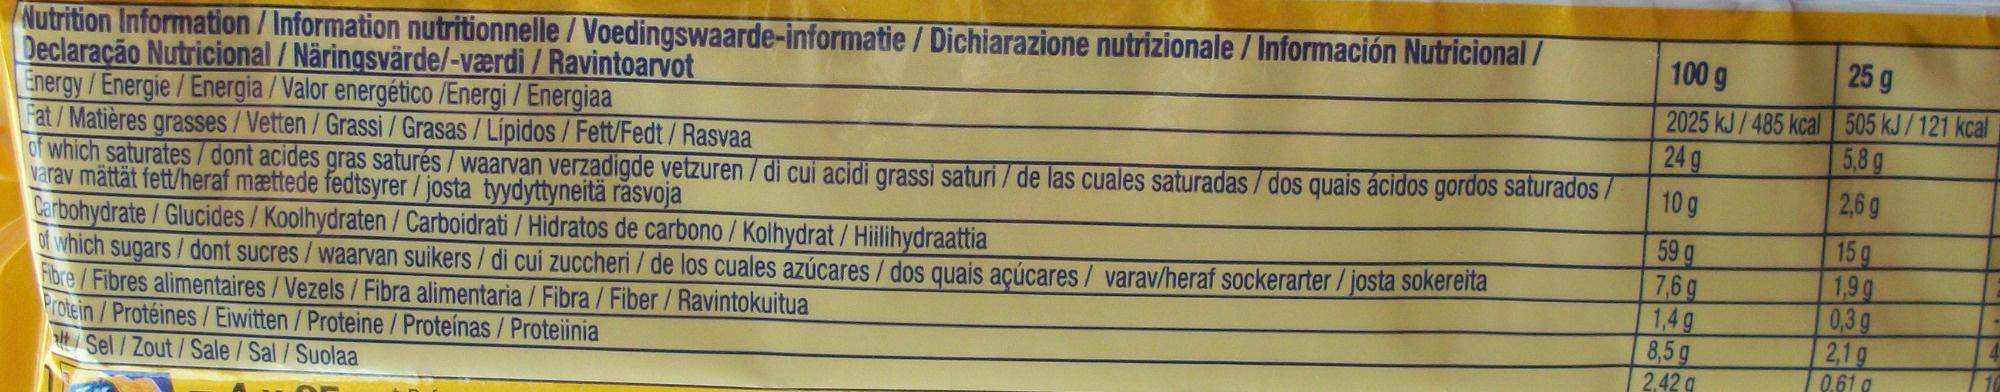 TUC gusto cheese - Informação nutricional